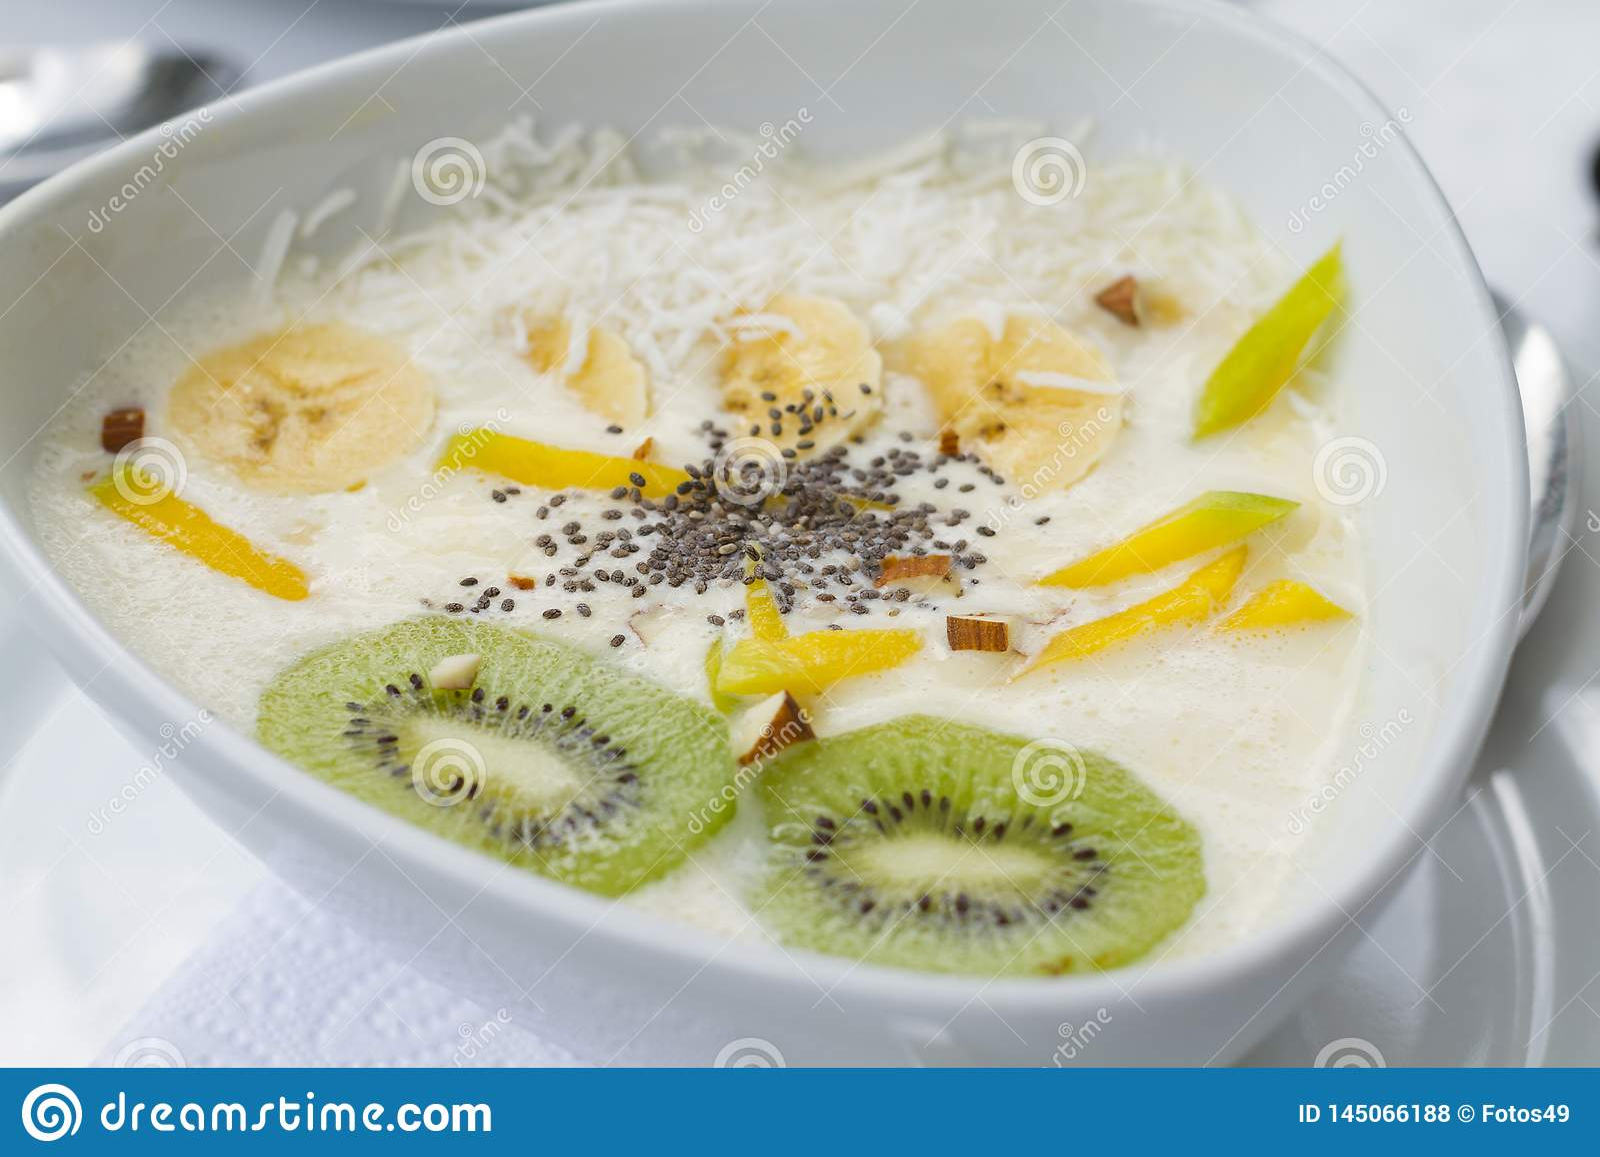 Yogurt with mango chia kiwi in white ceramic dish with white tablecloths